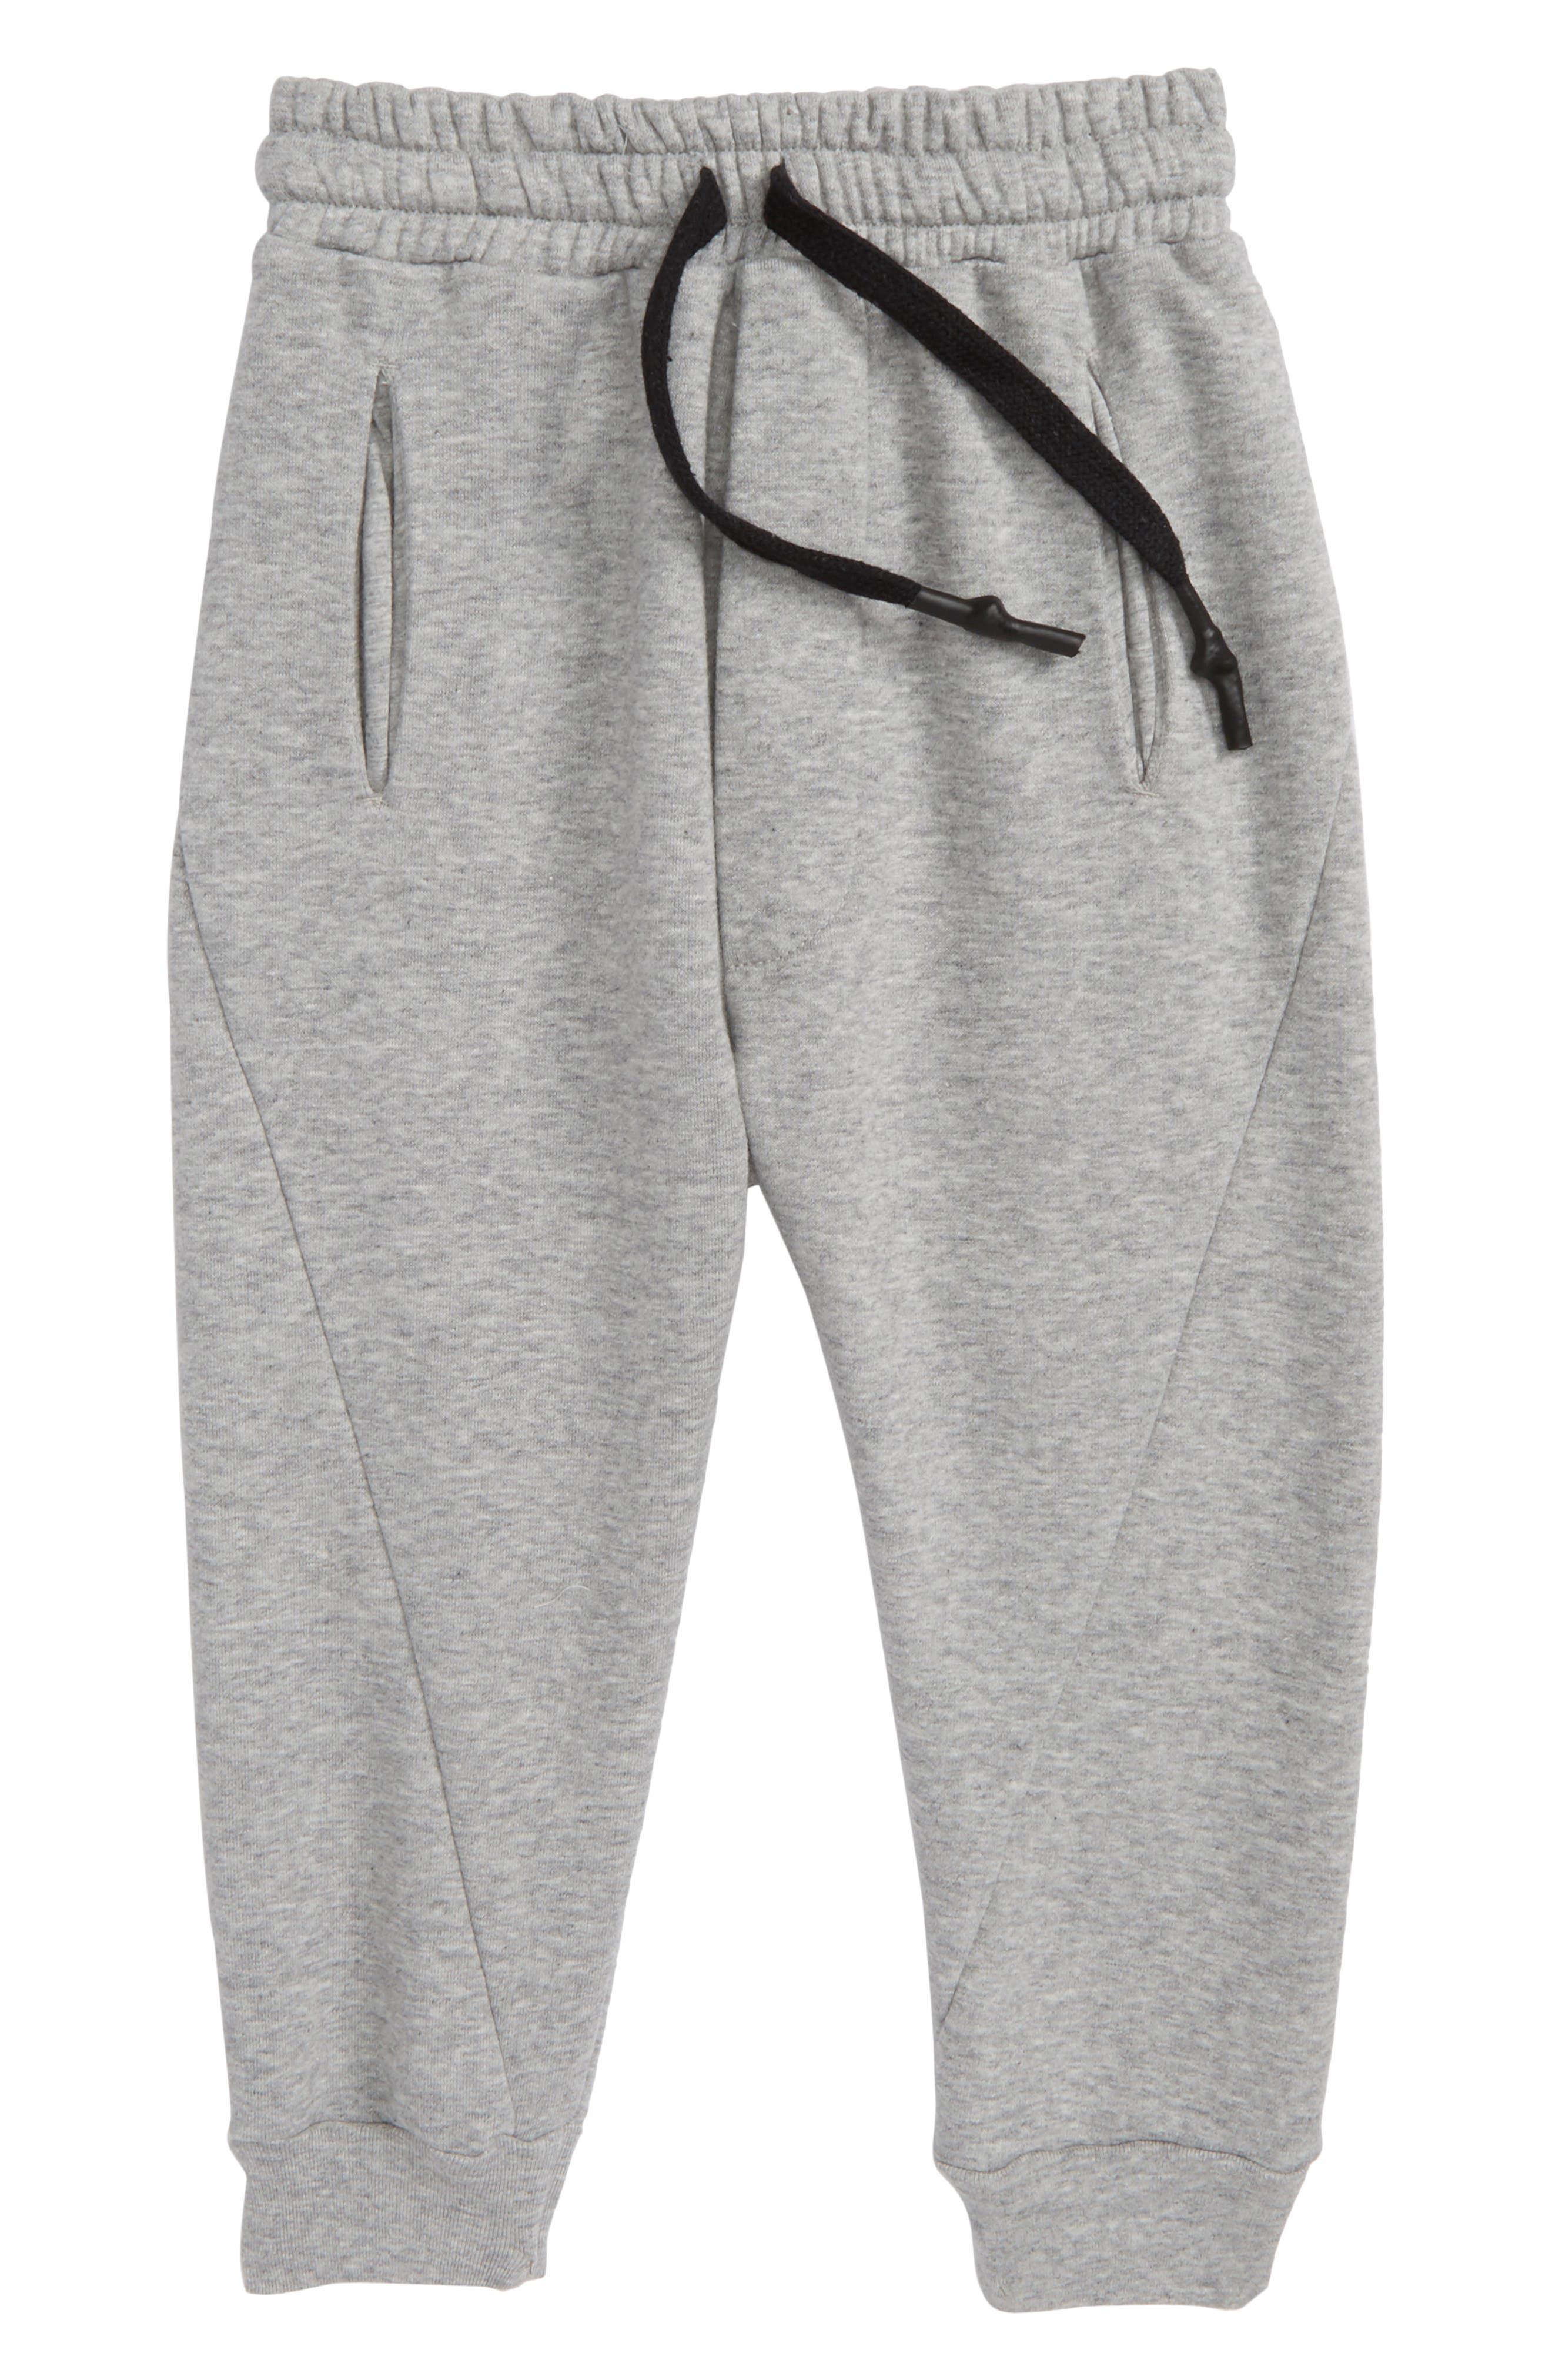 Solid Sweatpants,                             Main thumbnail 1, color,                             Heather Grey